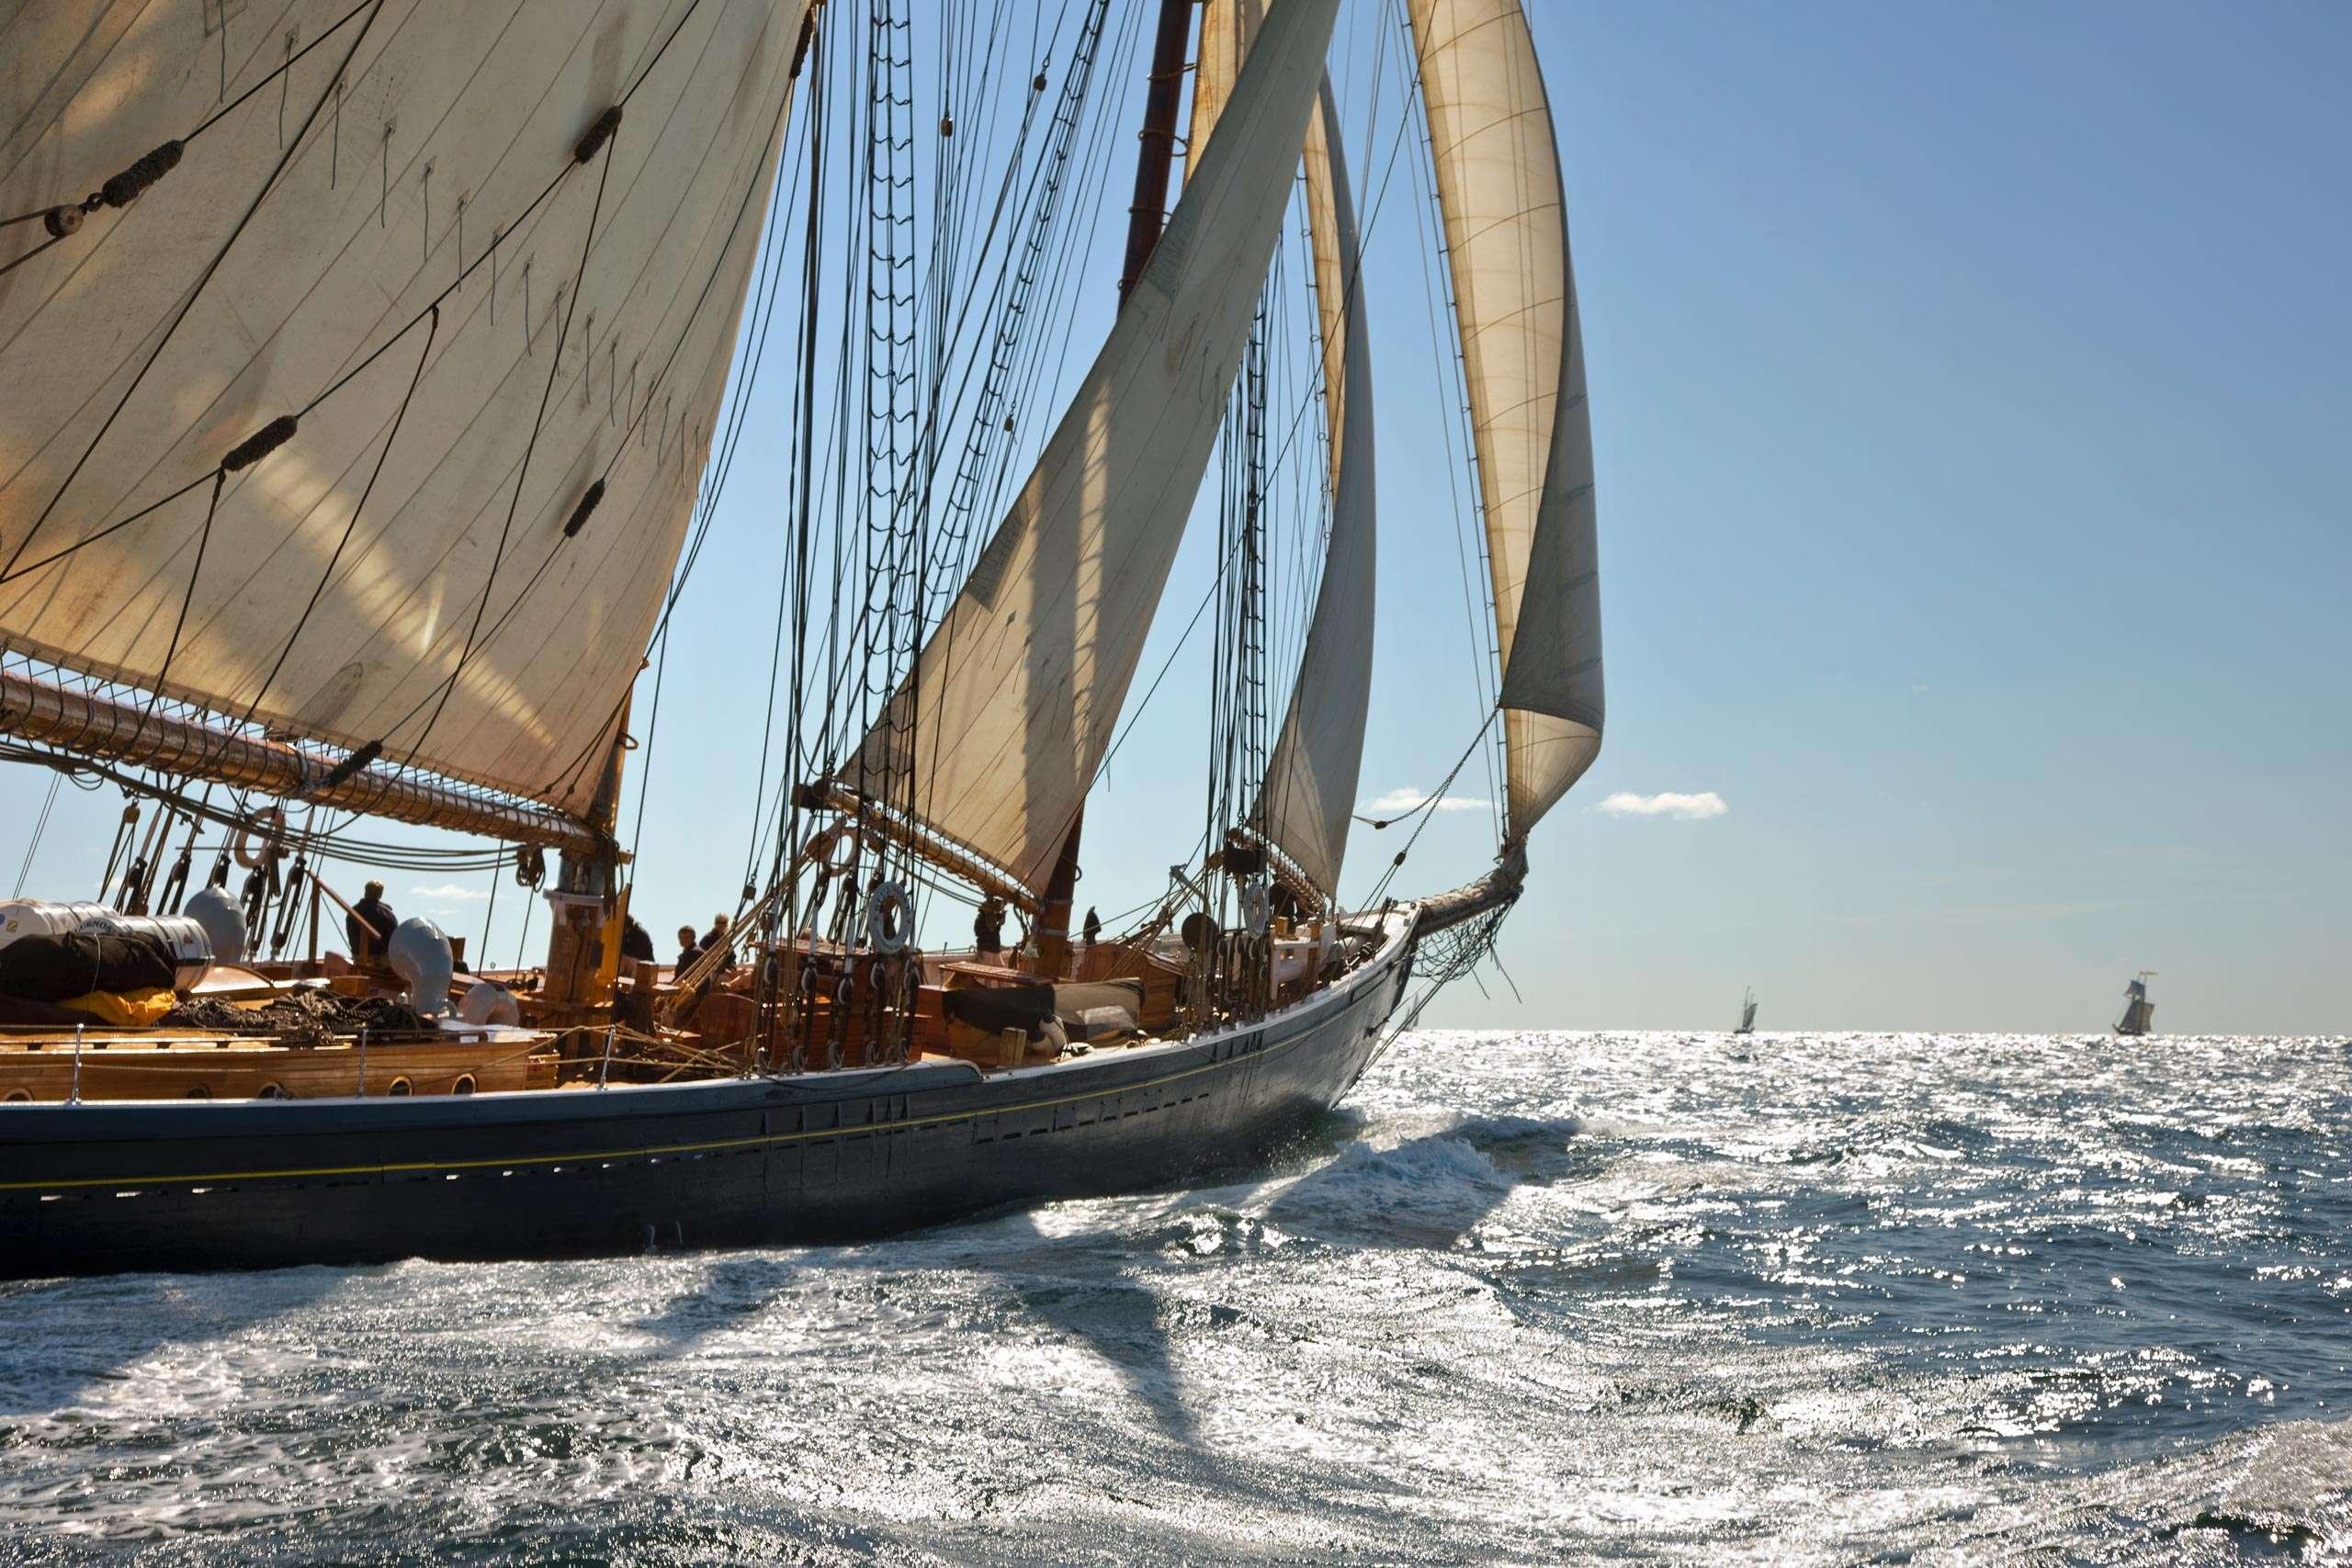 PORTFOLIO - Sailing - Windjammers #12   PCG444